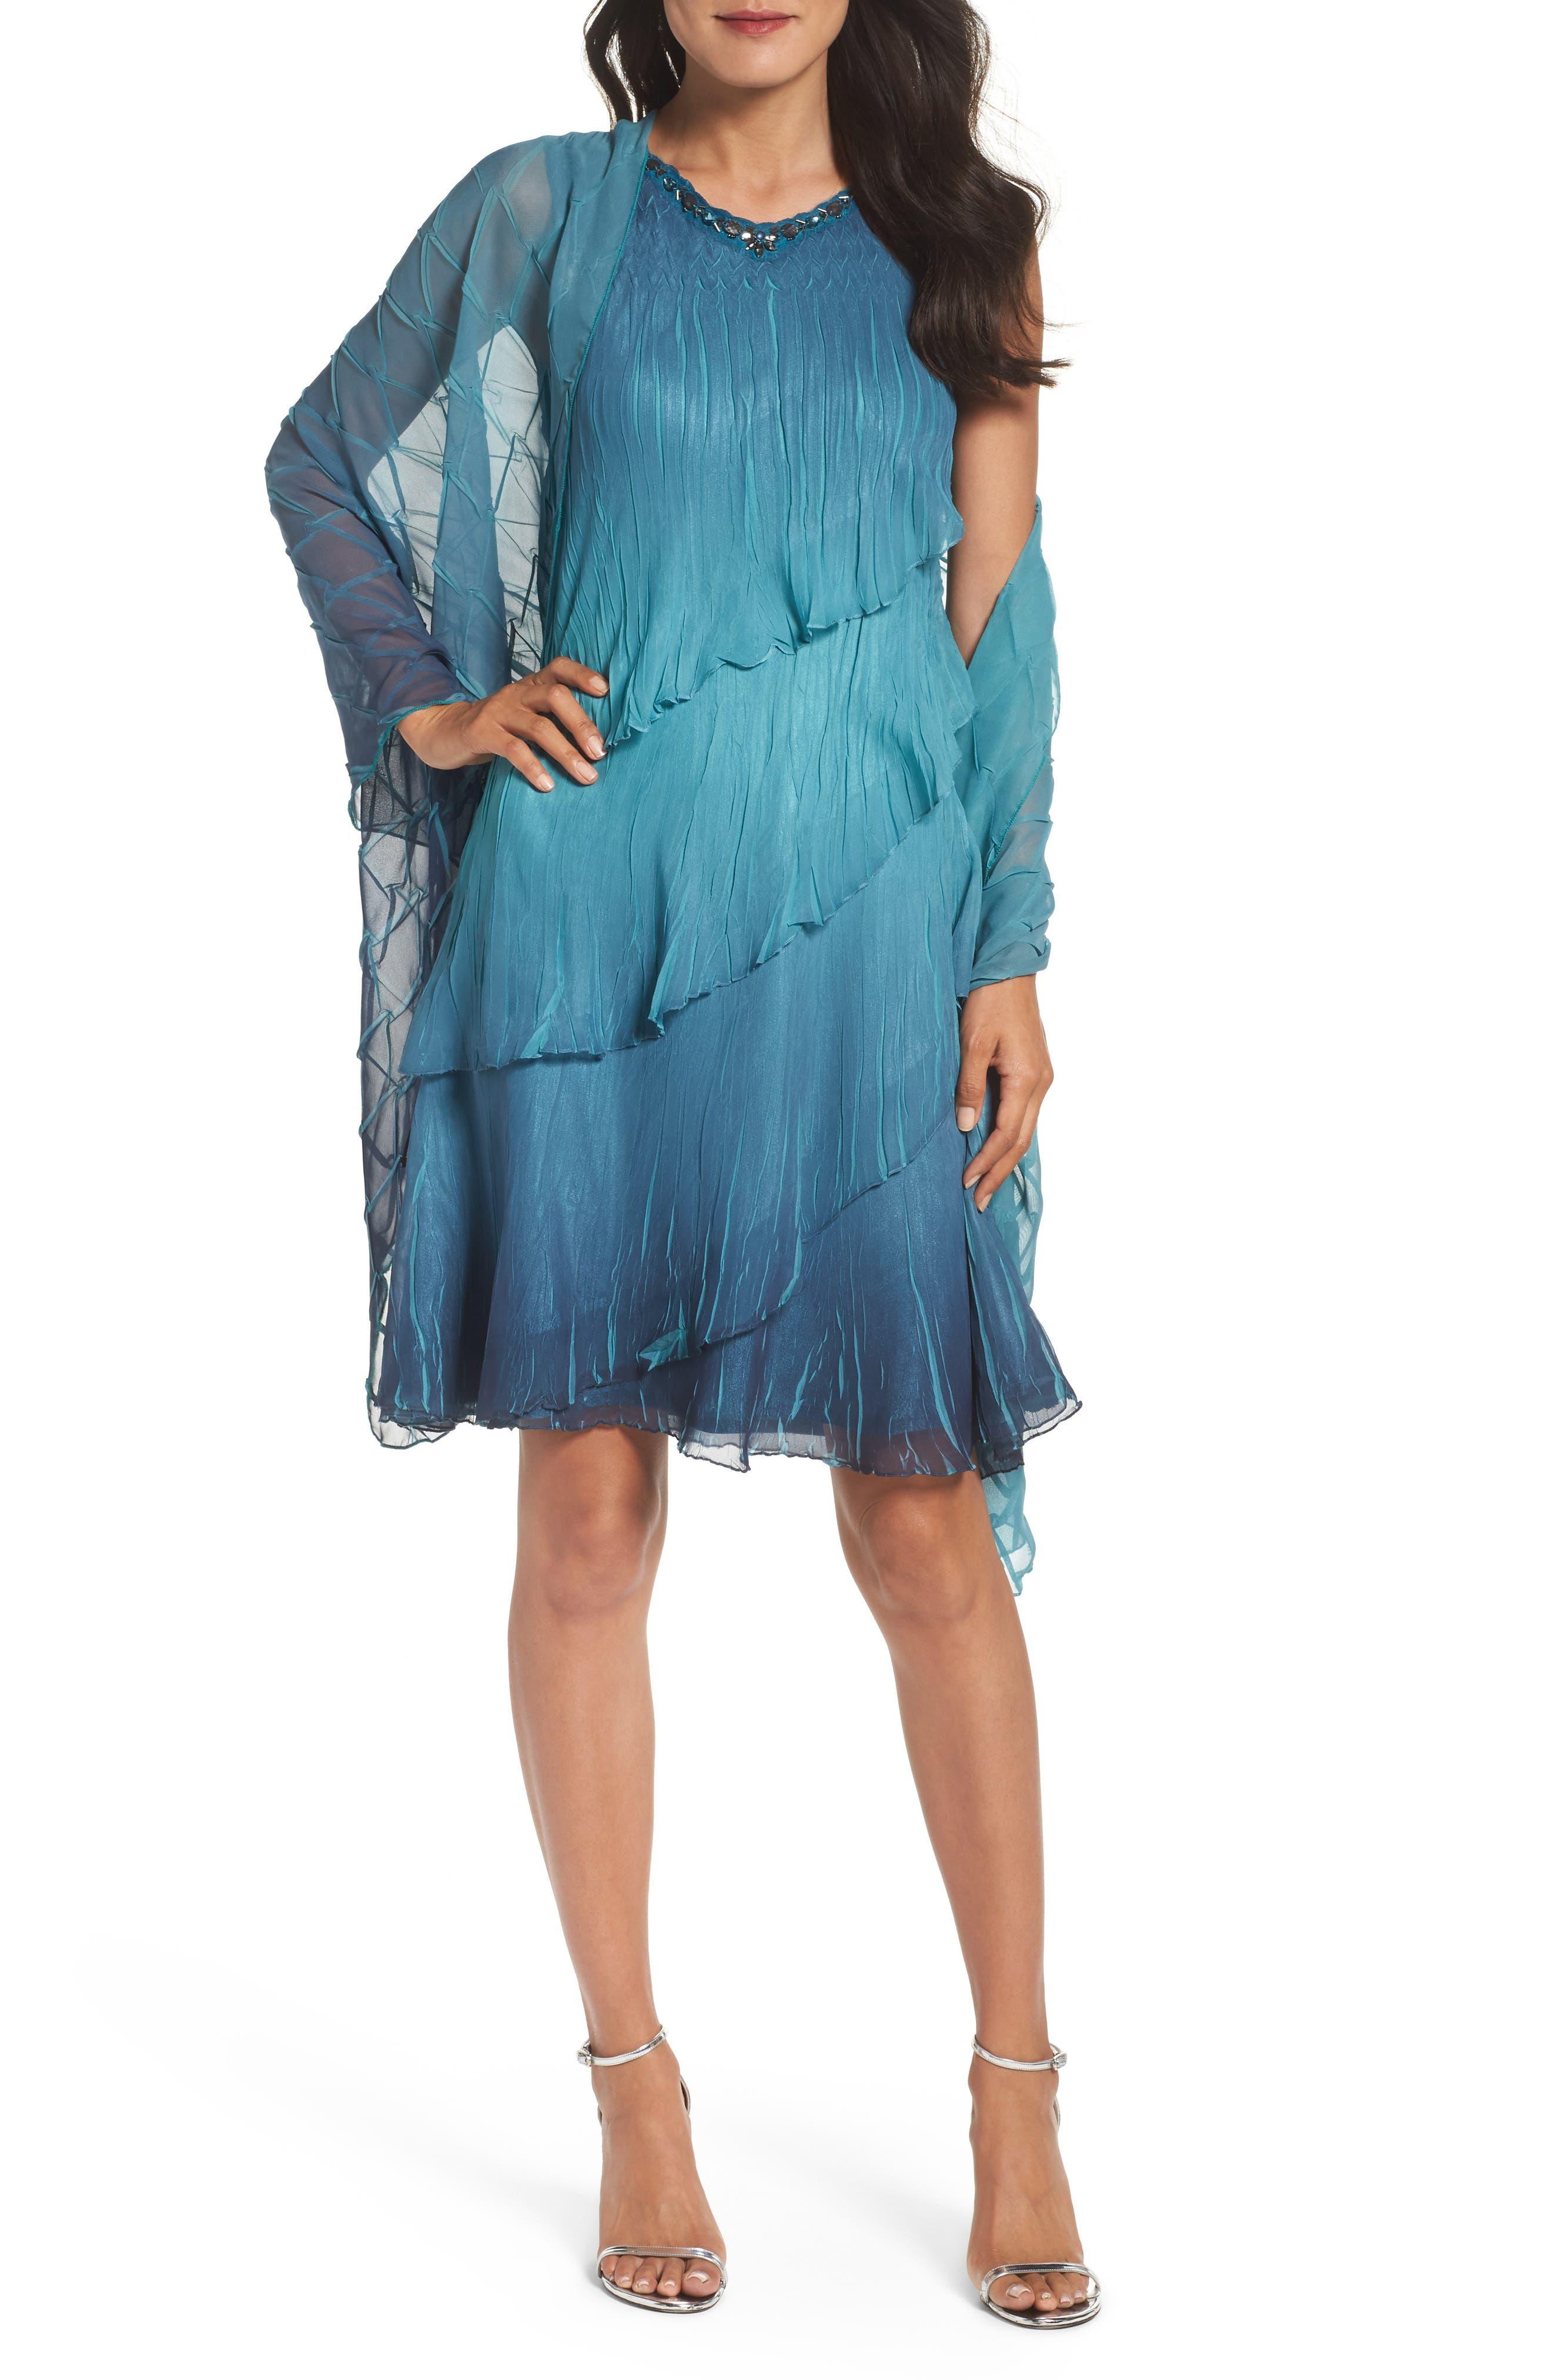 Tiered Chiffon Shift Dress with Shawl,                             Main thumbnail 1, color,                             Marine Night Ombre